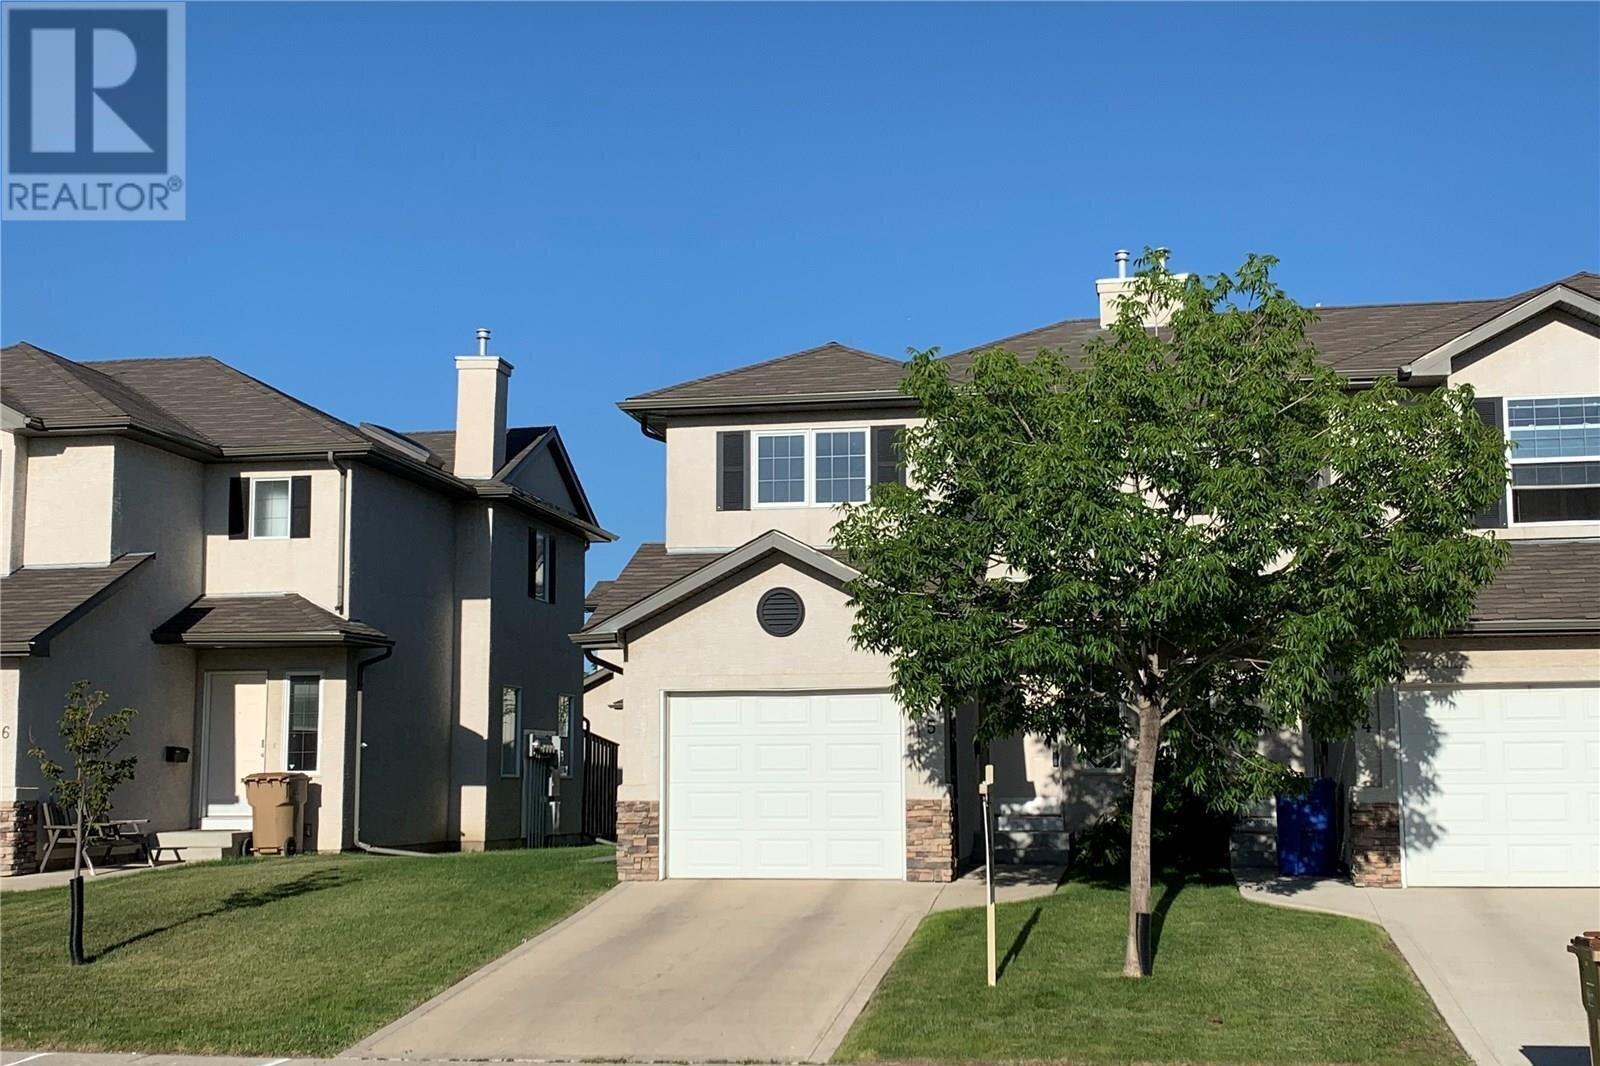 Townhouse for sale at 3101 Tregarva Dr E Unit 5 Regina Saskatchewan - MLS: SK819520